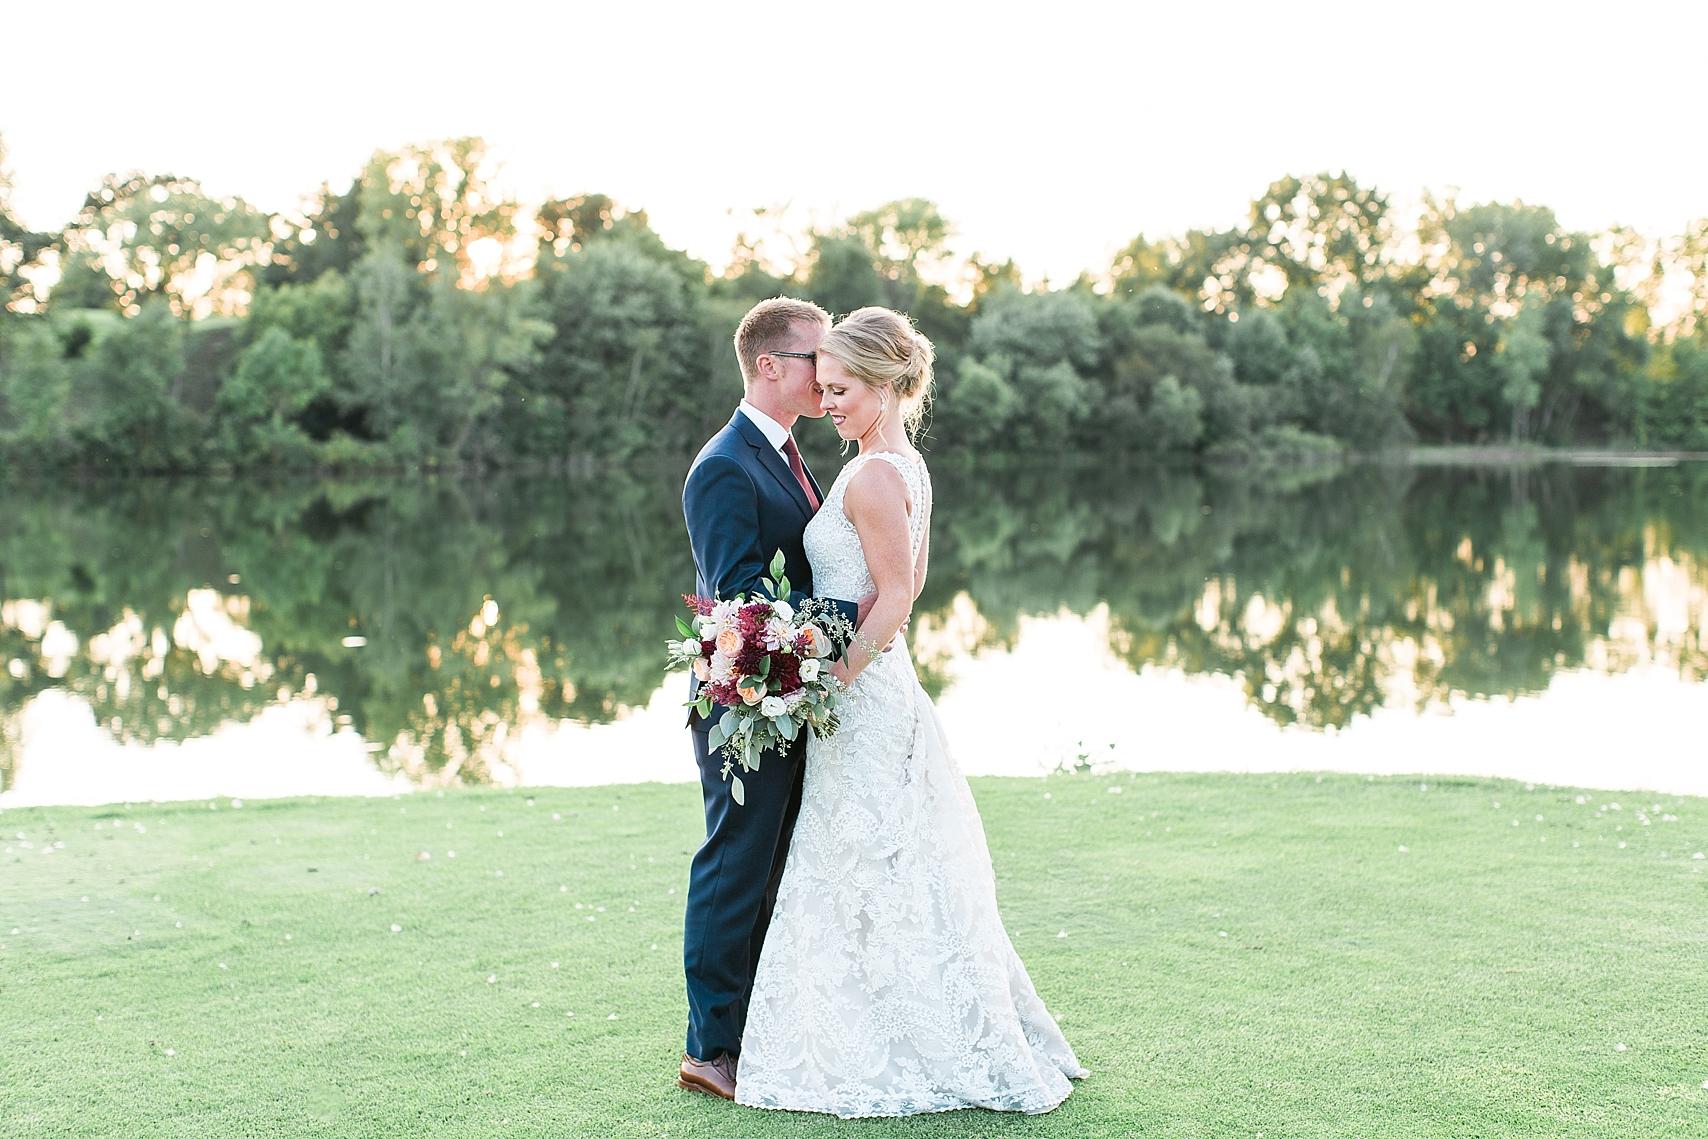 Minnesota Minneapolis Wedding Photographer Best Of 2018 Weddings Mallory Kiesow Photography_0113.jpg